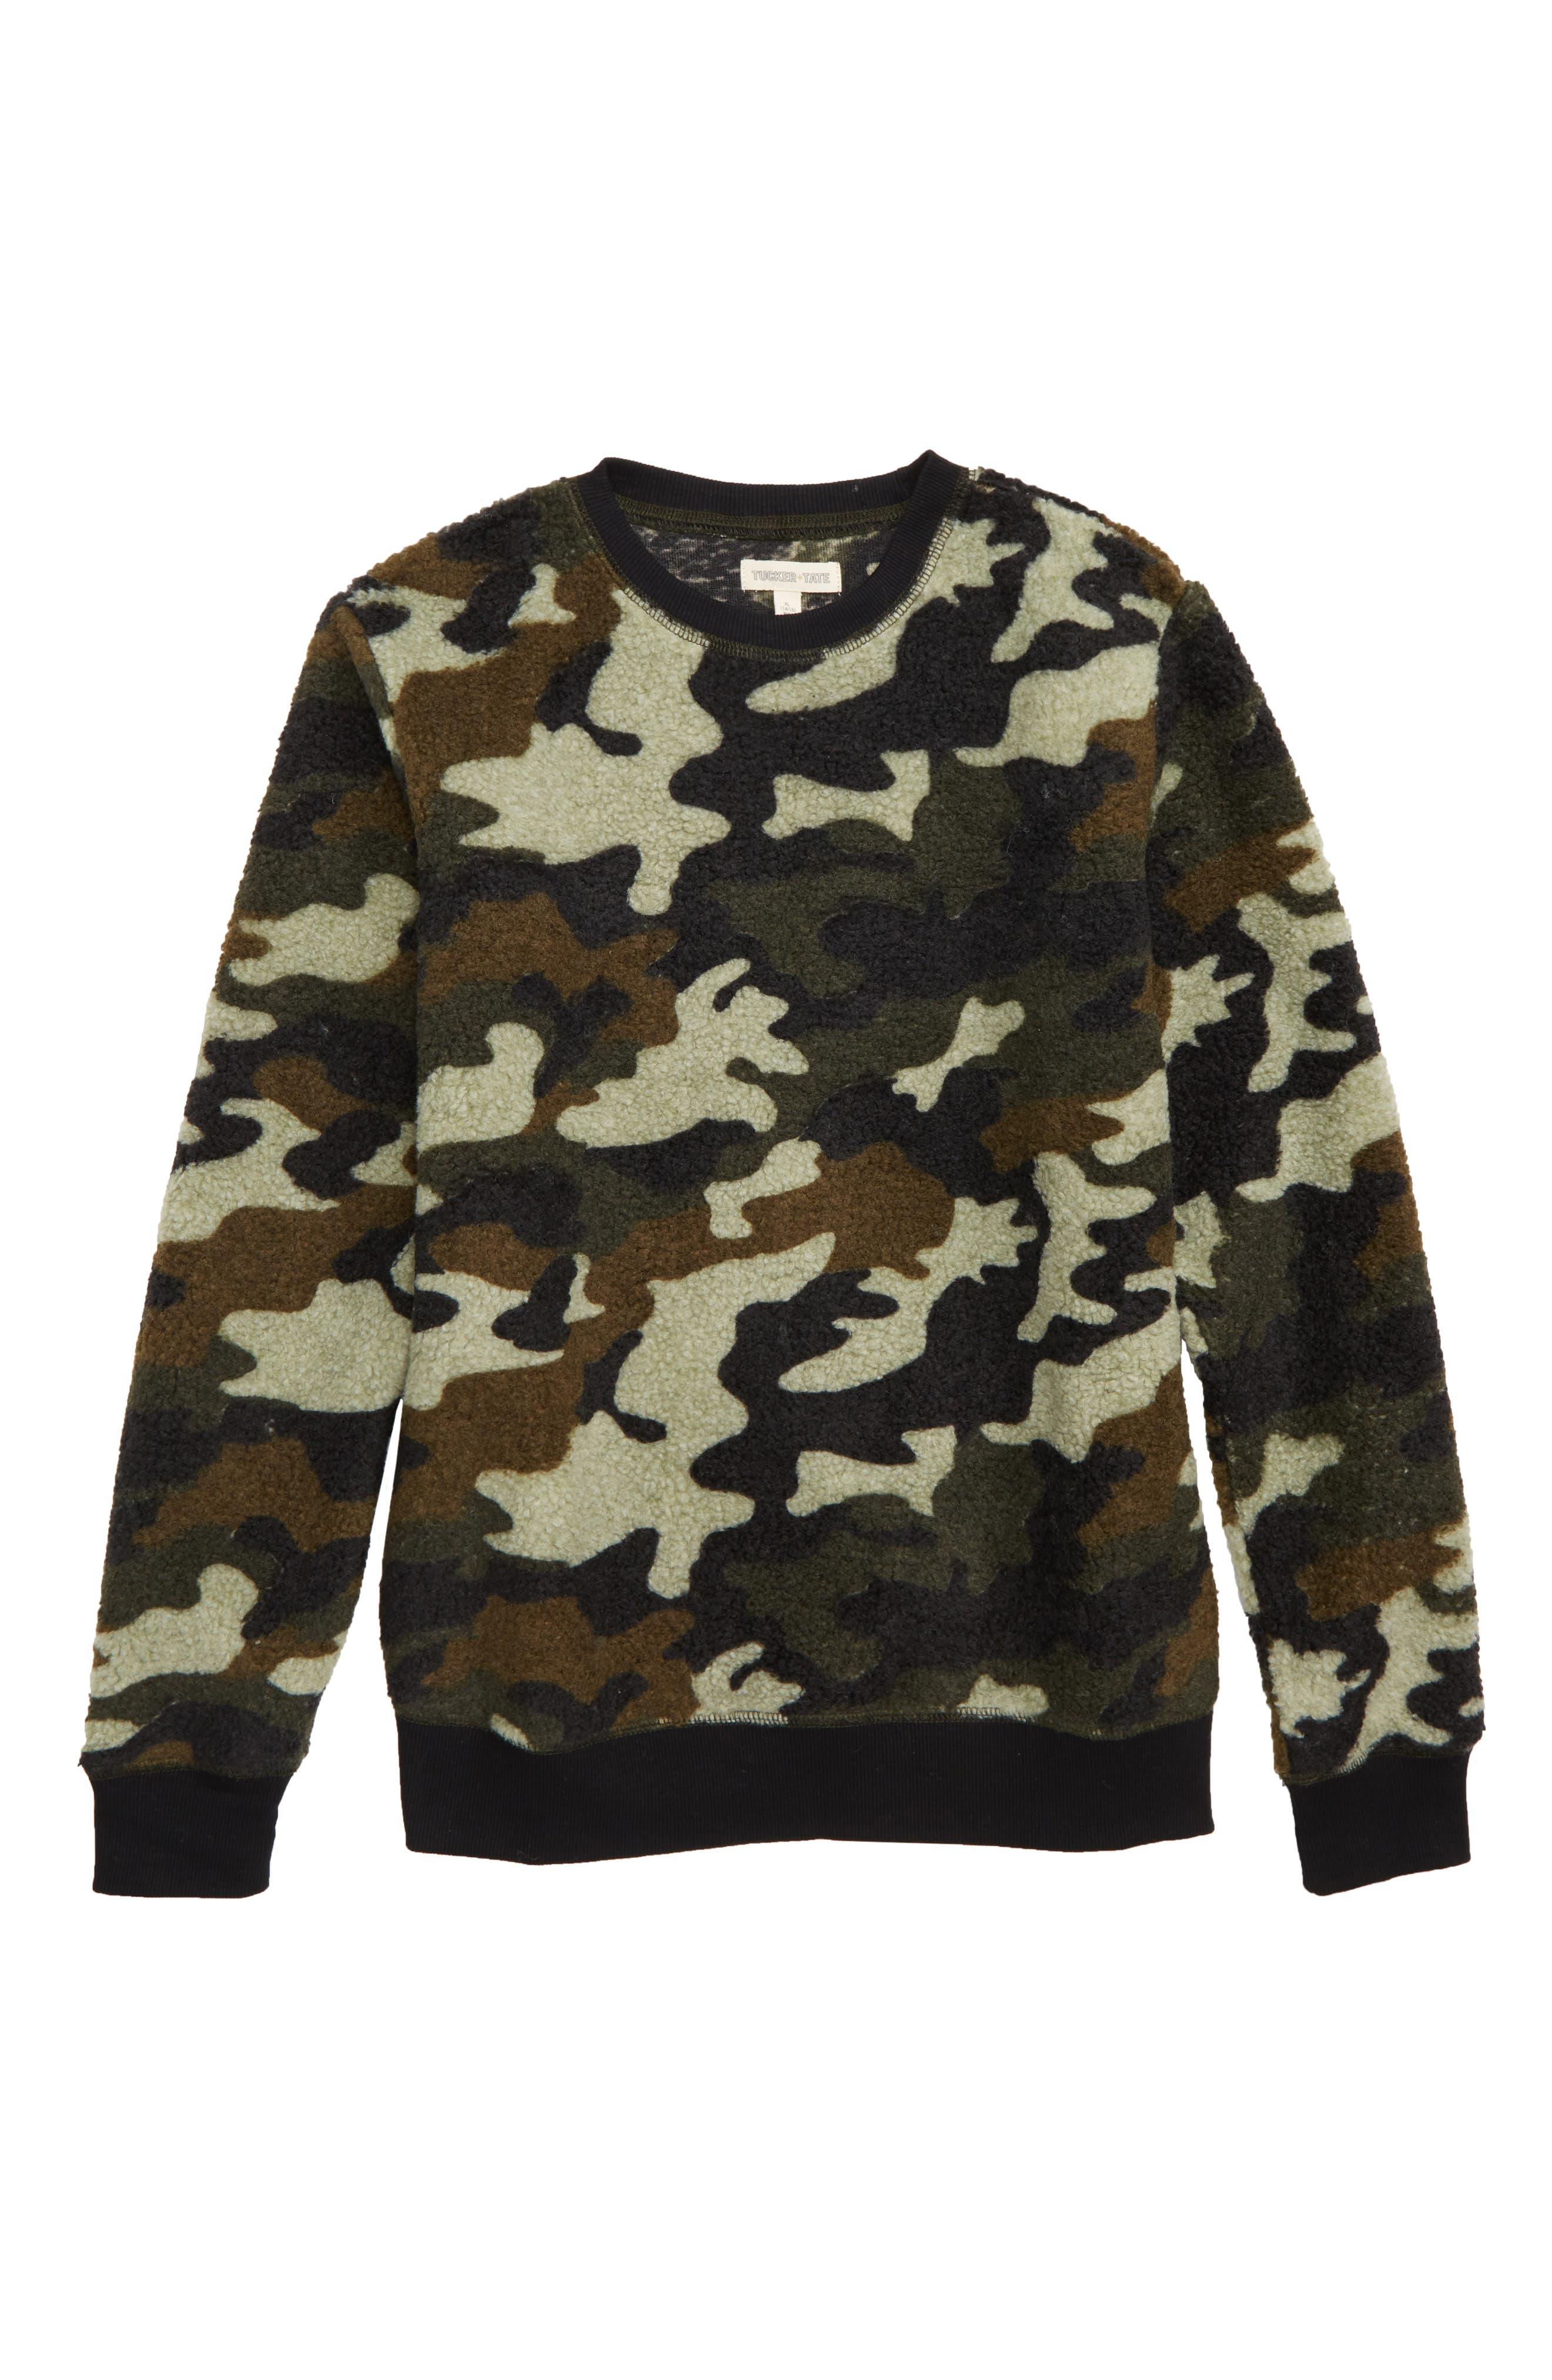 Fleece Camo Crewneck Sweatshirt,                             Main thumbnail 1, color,                             OLIVE SARMA CAMOUFLAGE